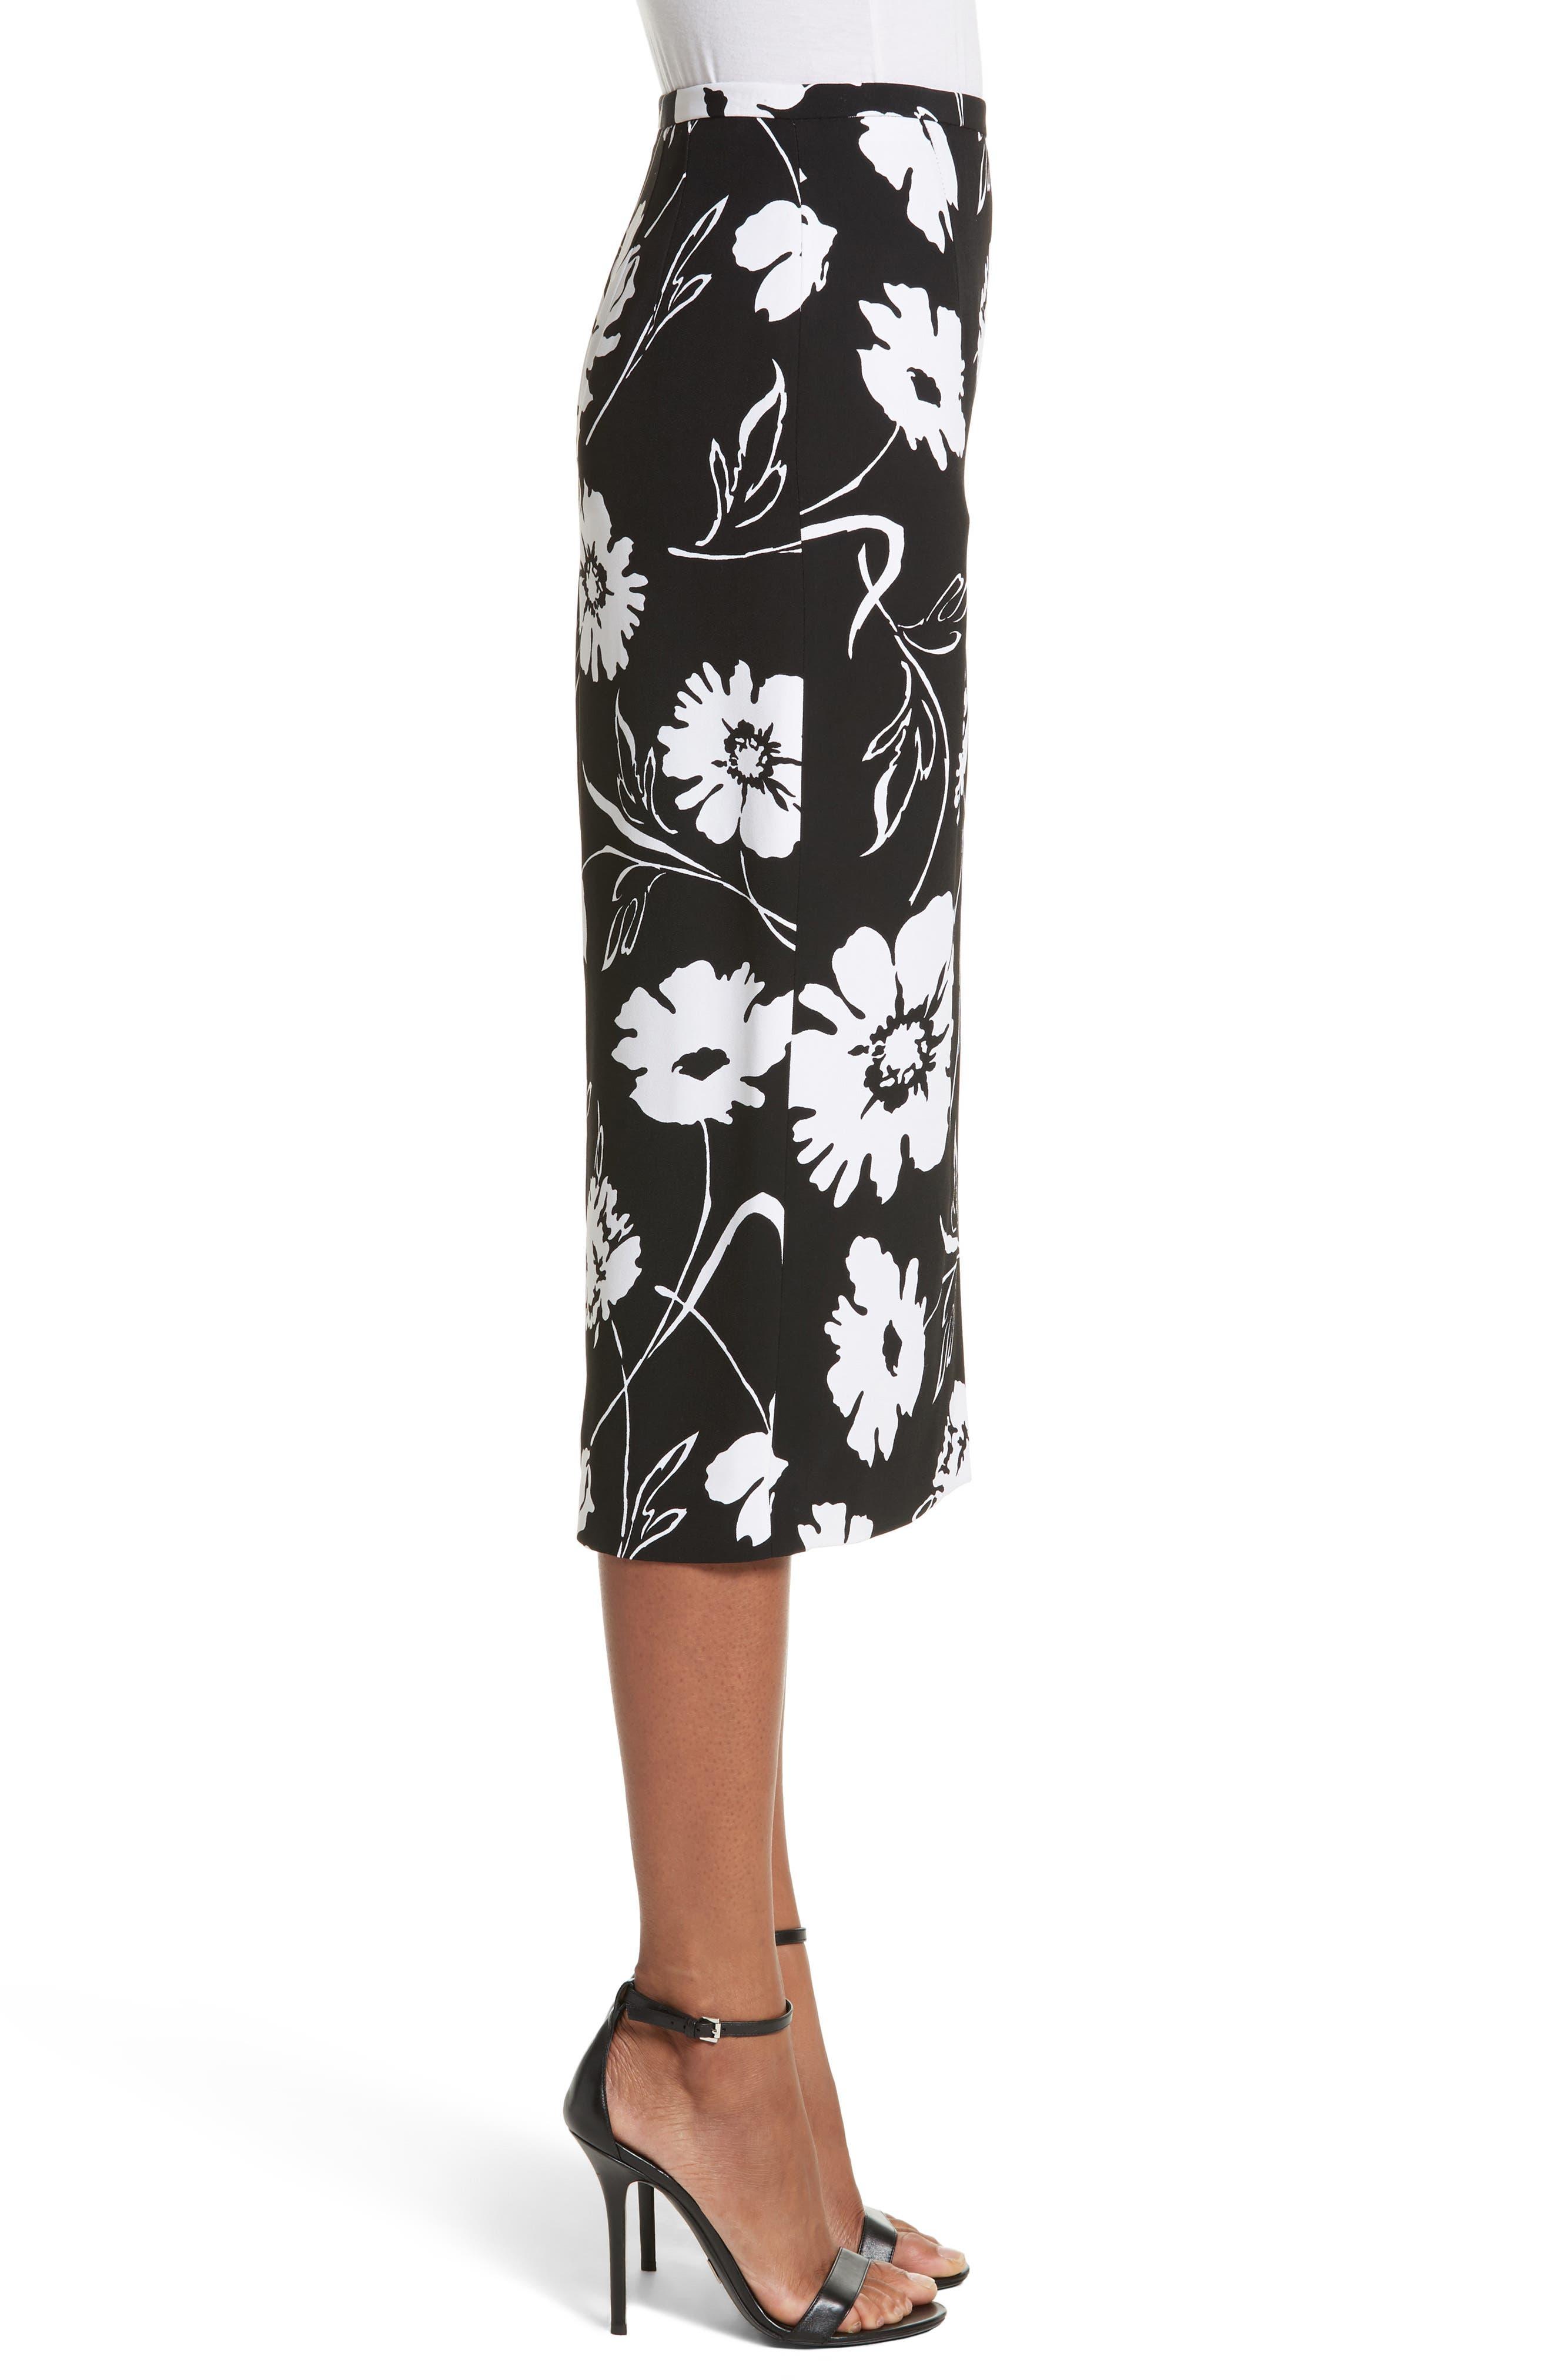 Floral Print Pencil Skirt,                             Alternate thumbnail 3, color,                             Black / White